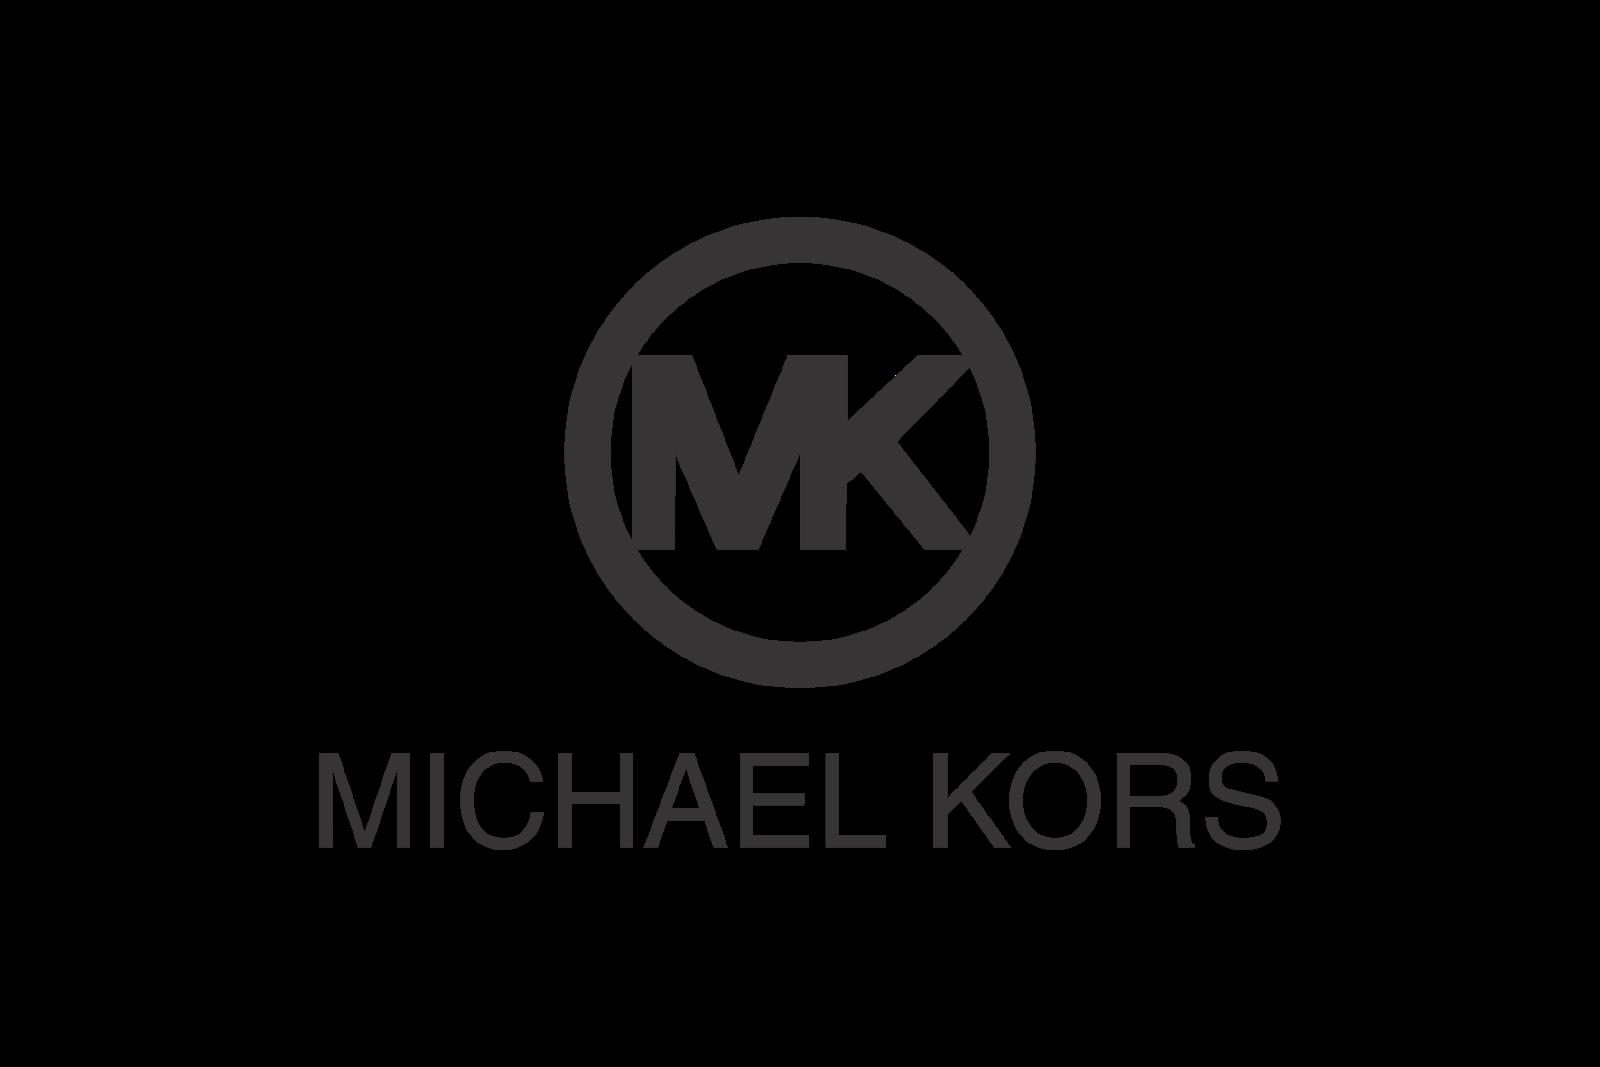 Logo Michael_Kors.png